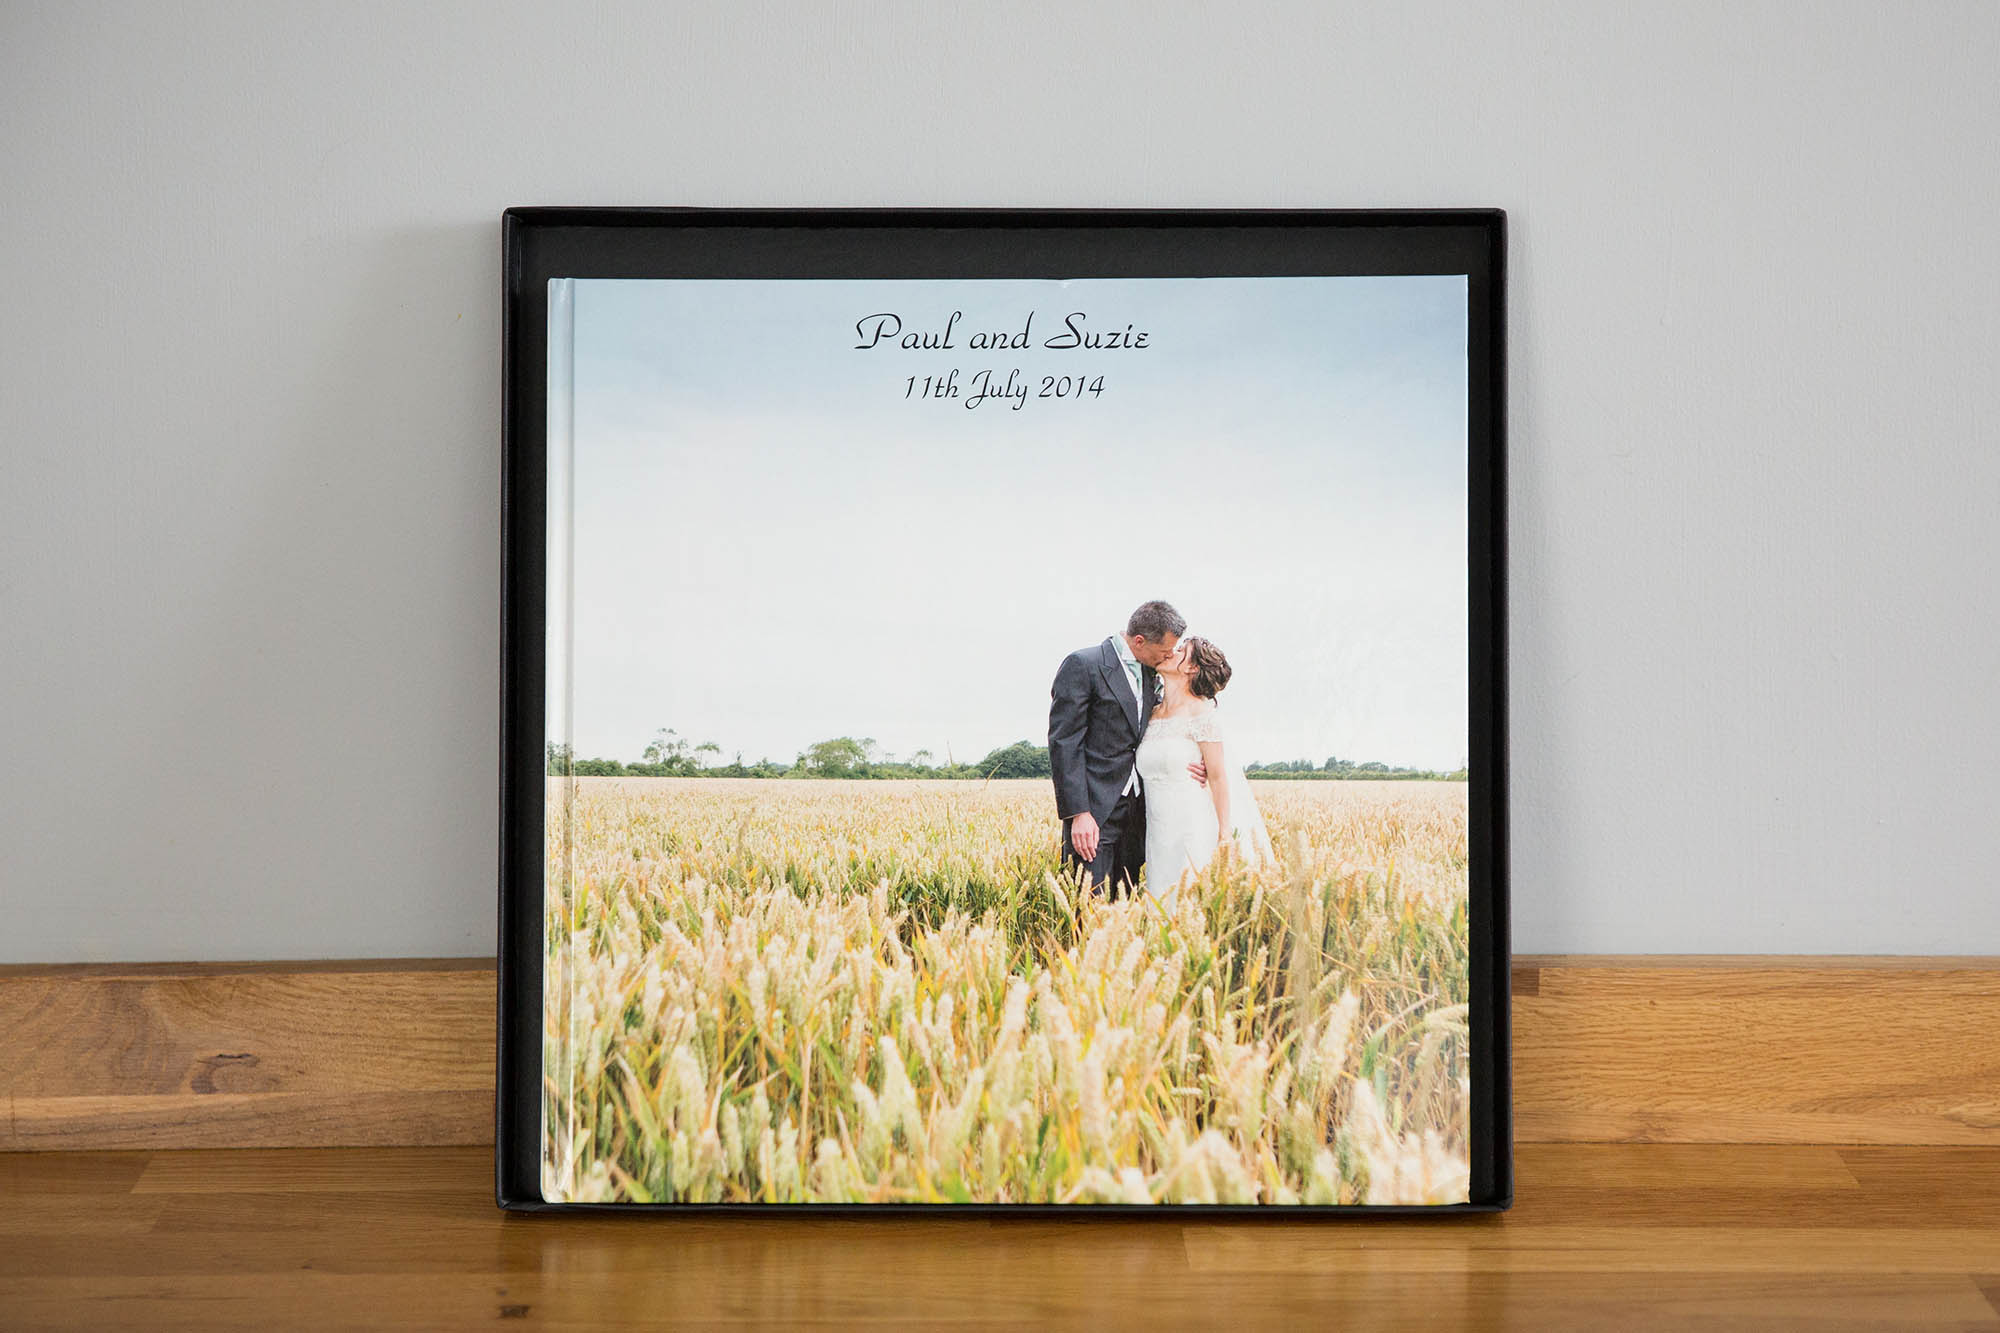 Julia_toms_wedding_album_story_book_002.jpg